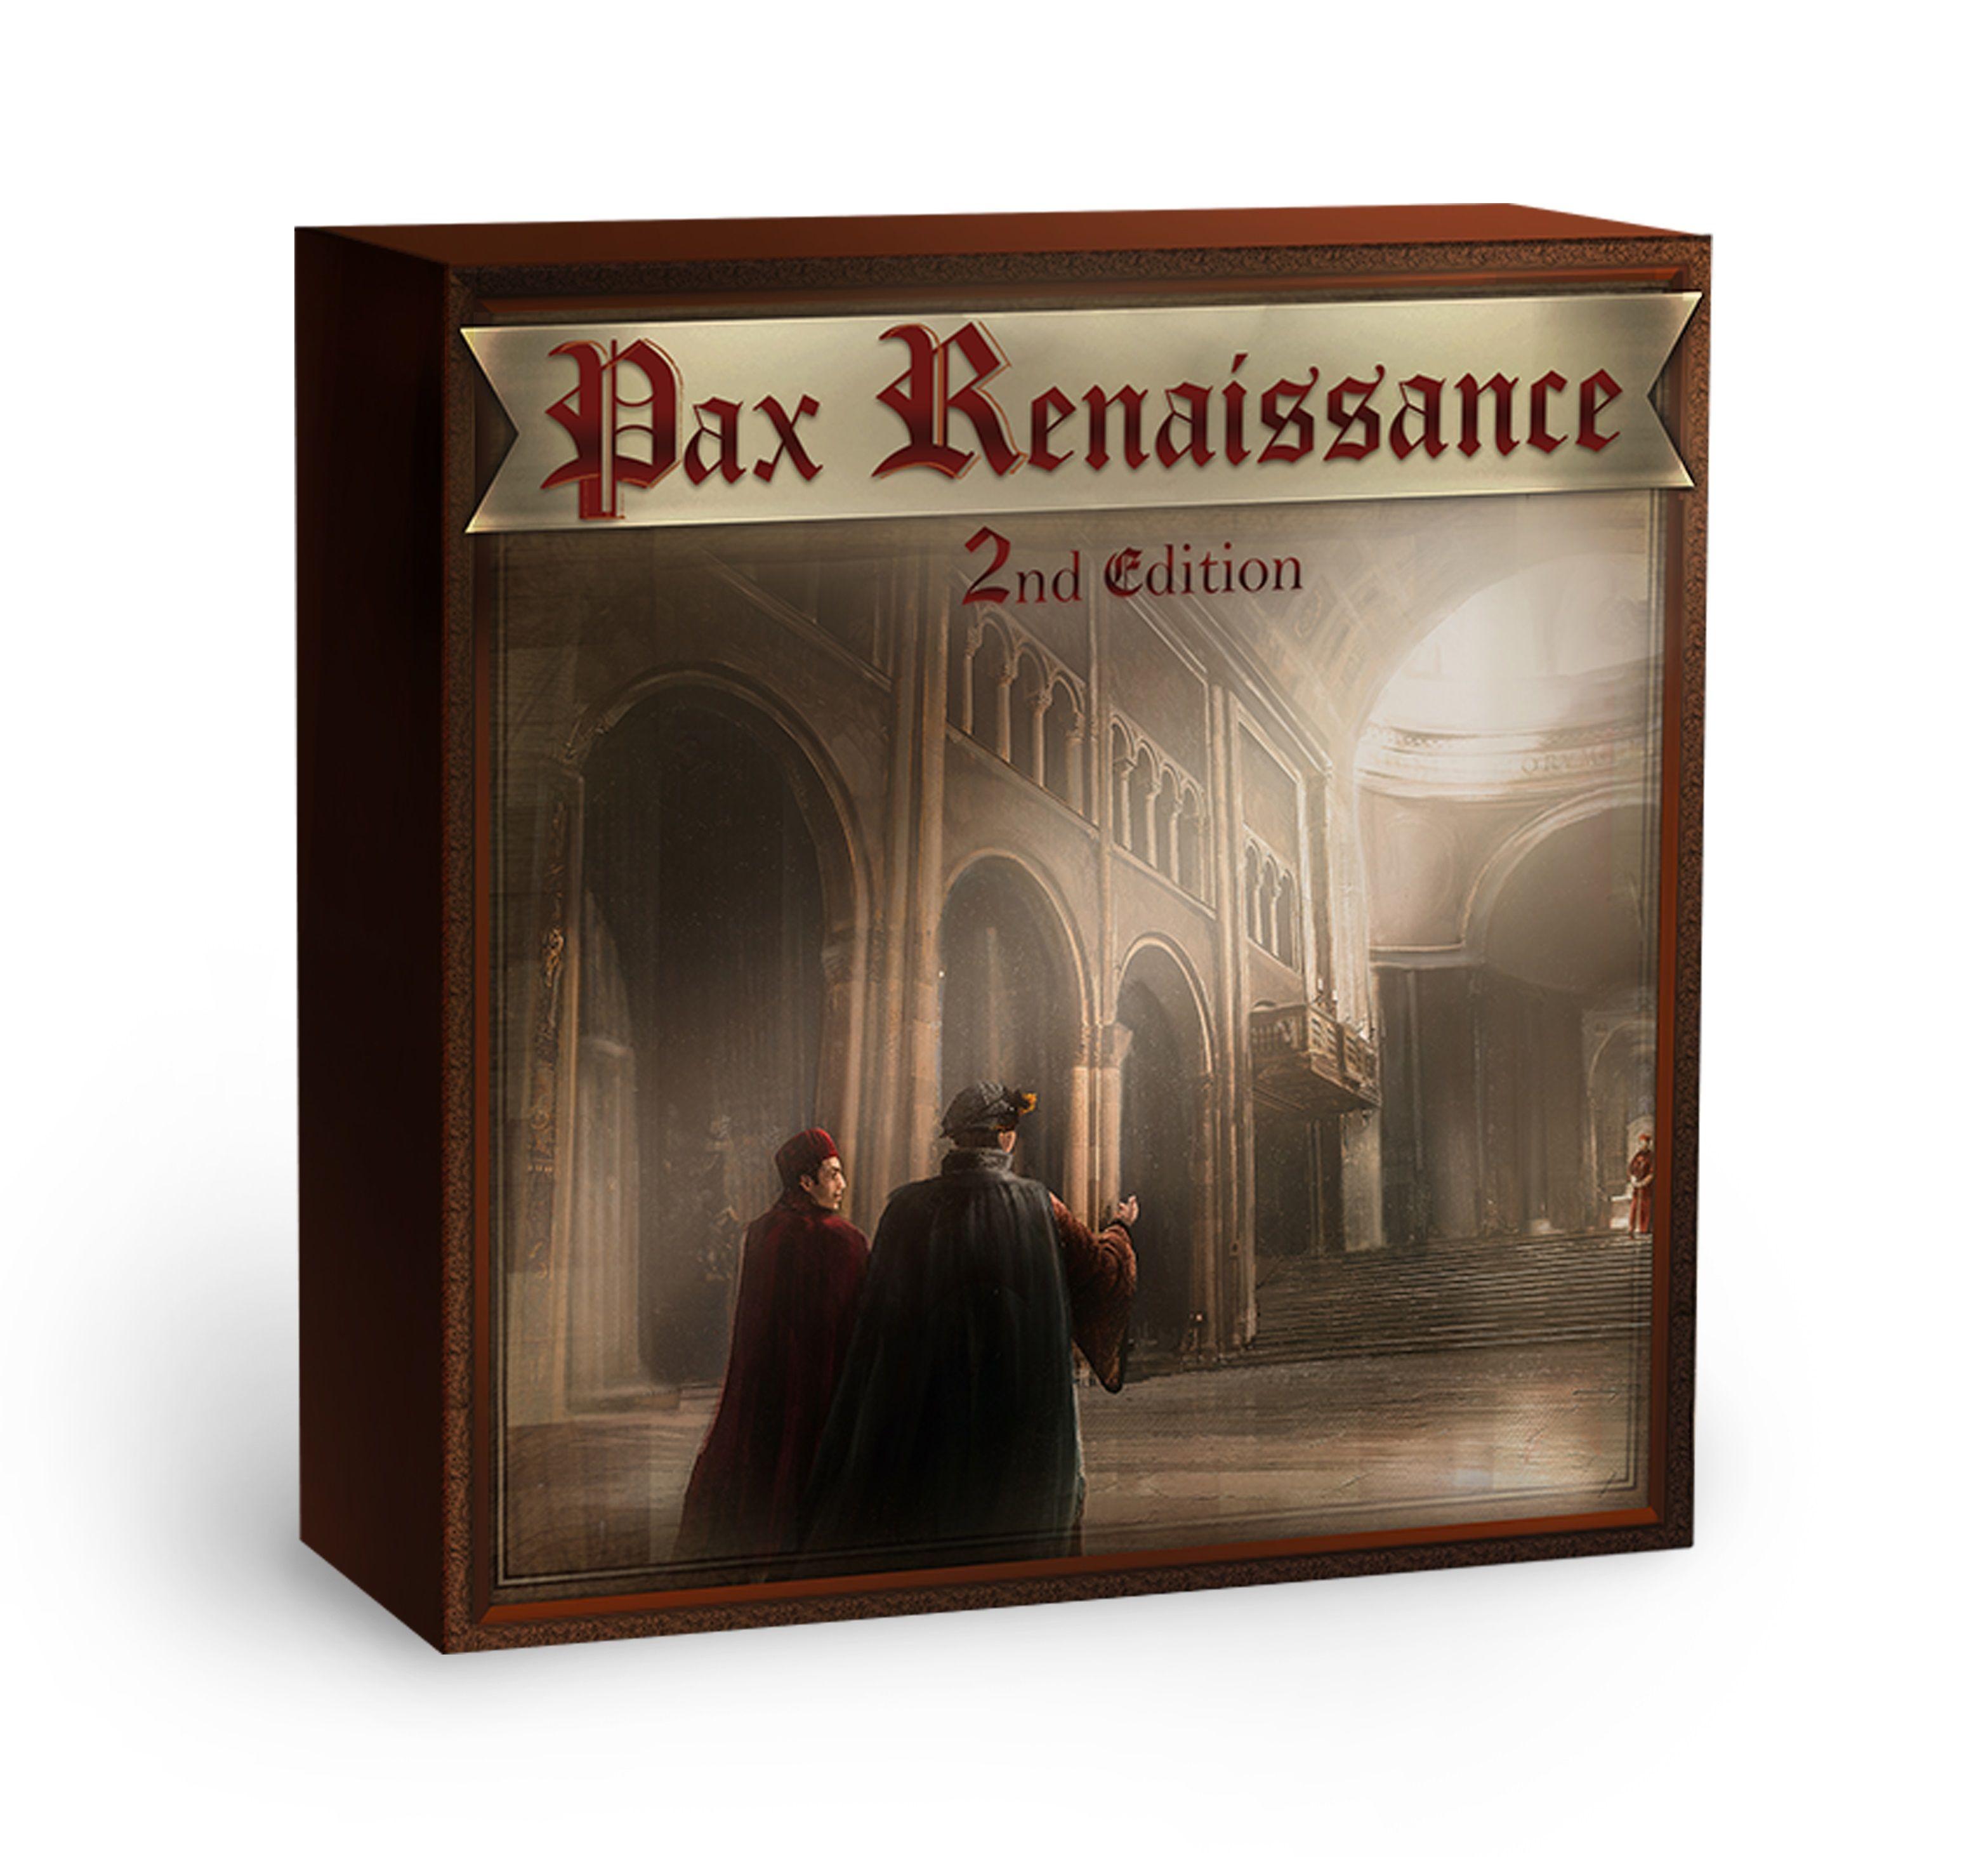 Pax Renaissance 2nd Edition